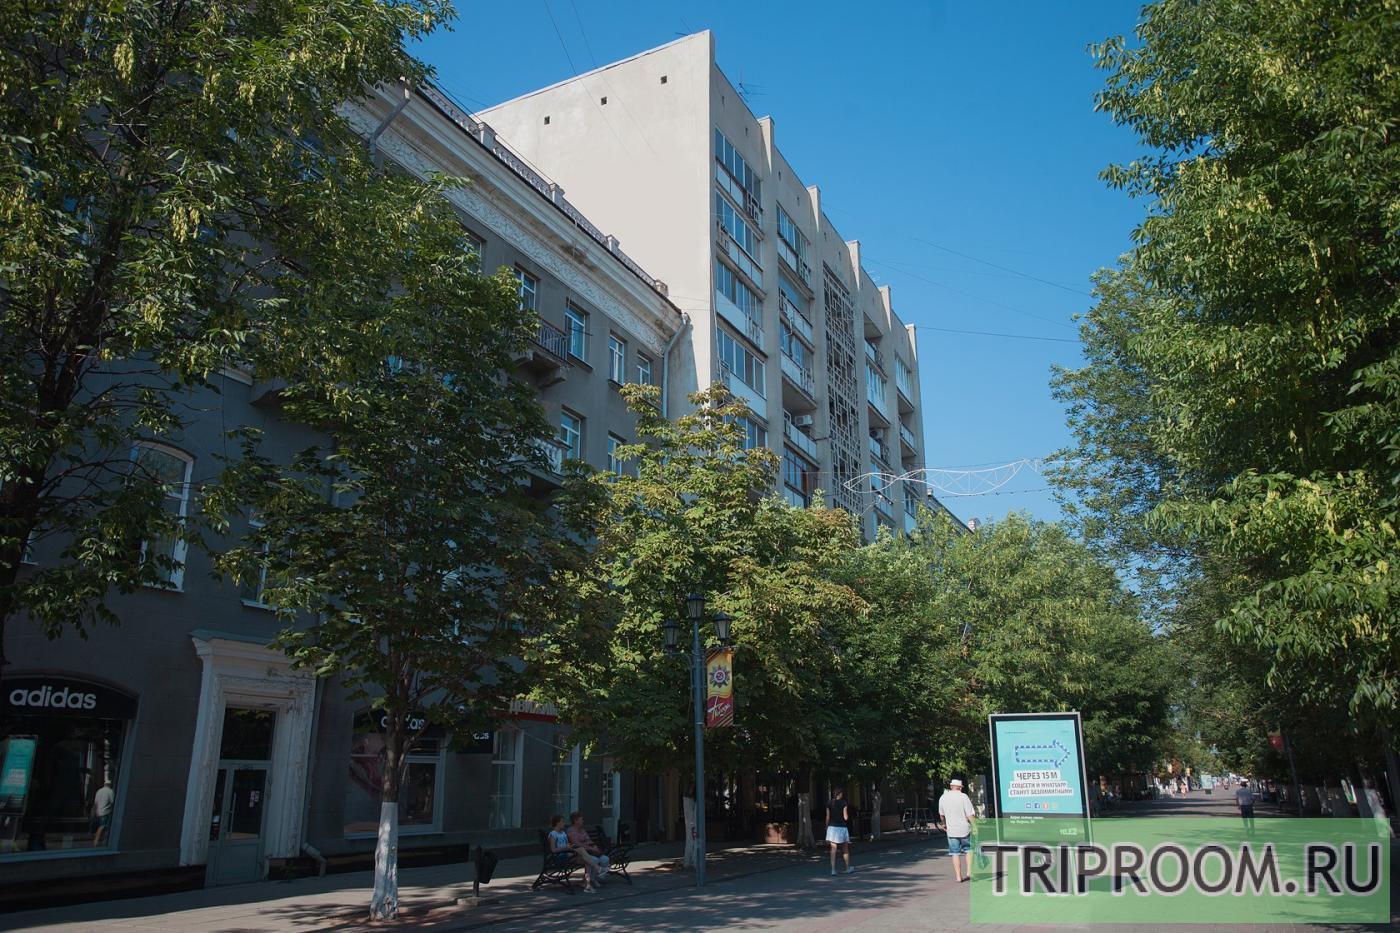 1-комнатная квартира посуточно (вариант № 30226), ул. Кирова проспект, фото № 15